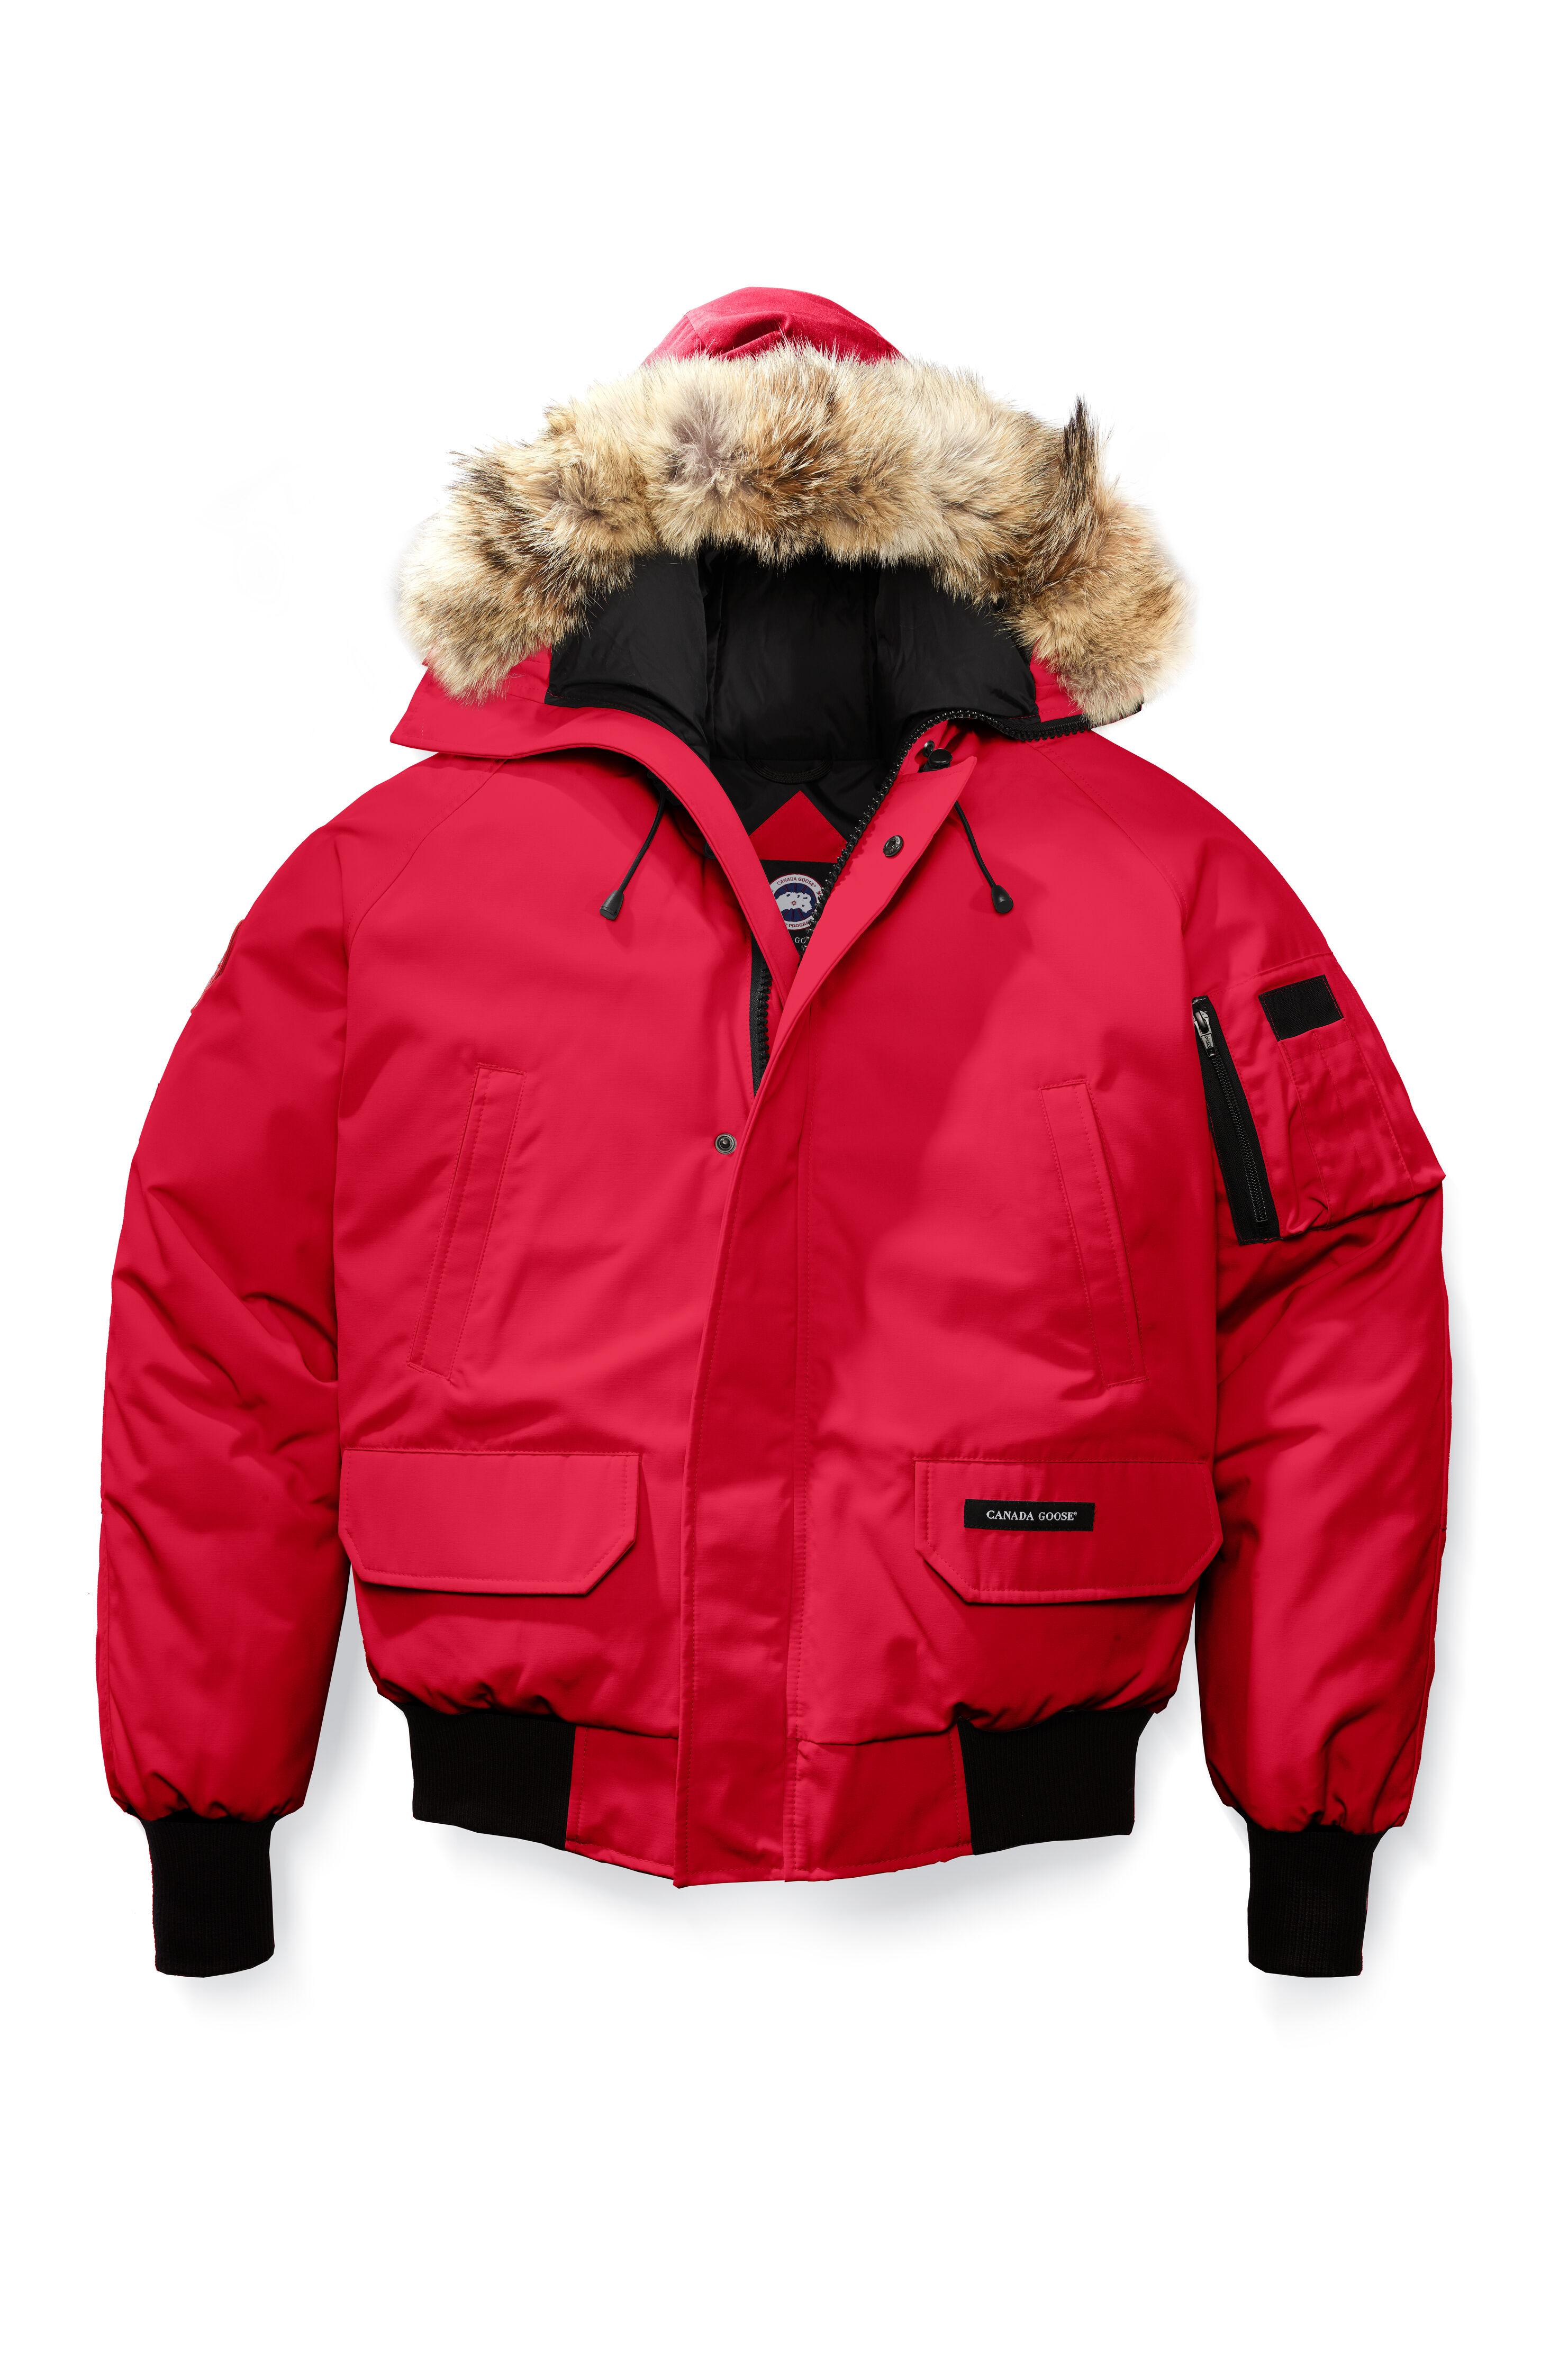 canada goose jacket sale edmonton